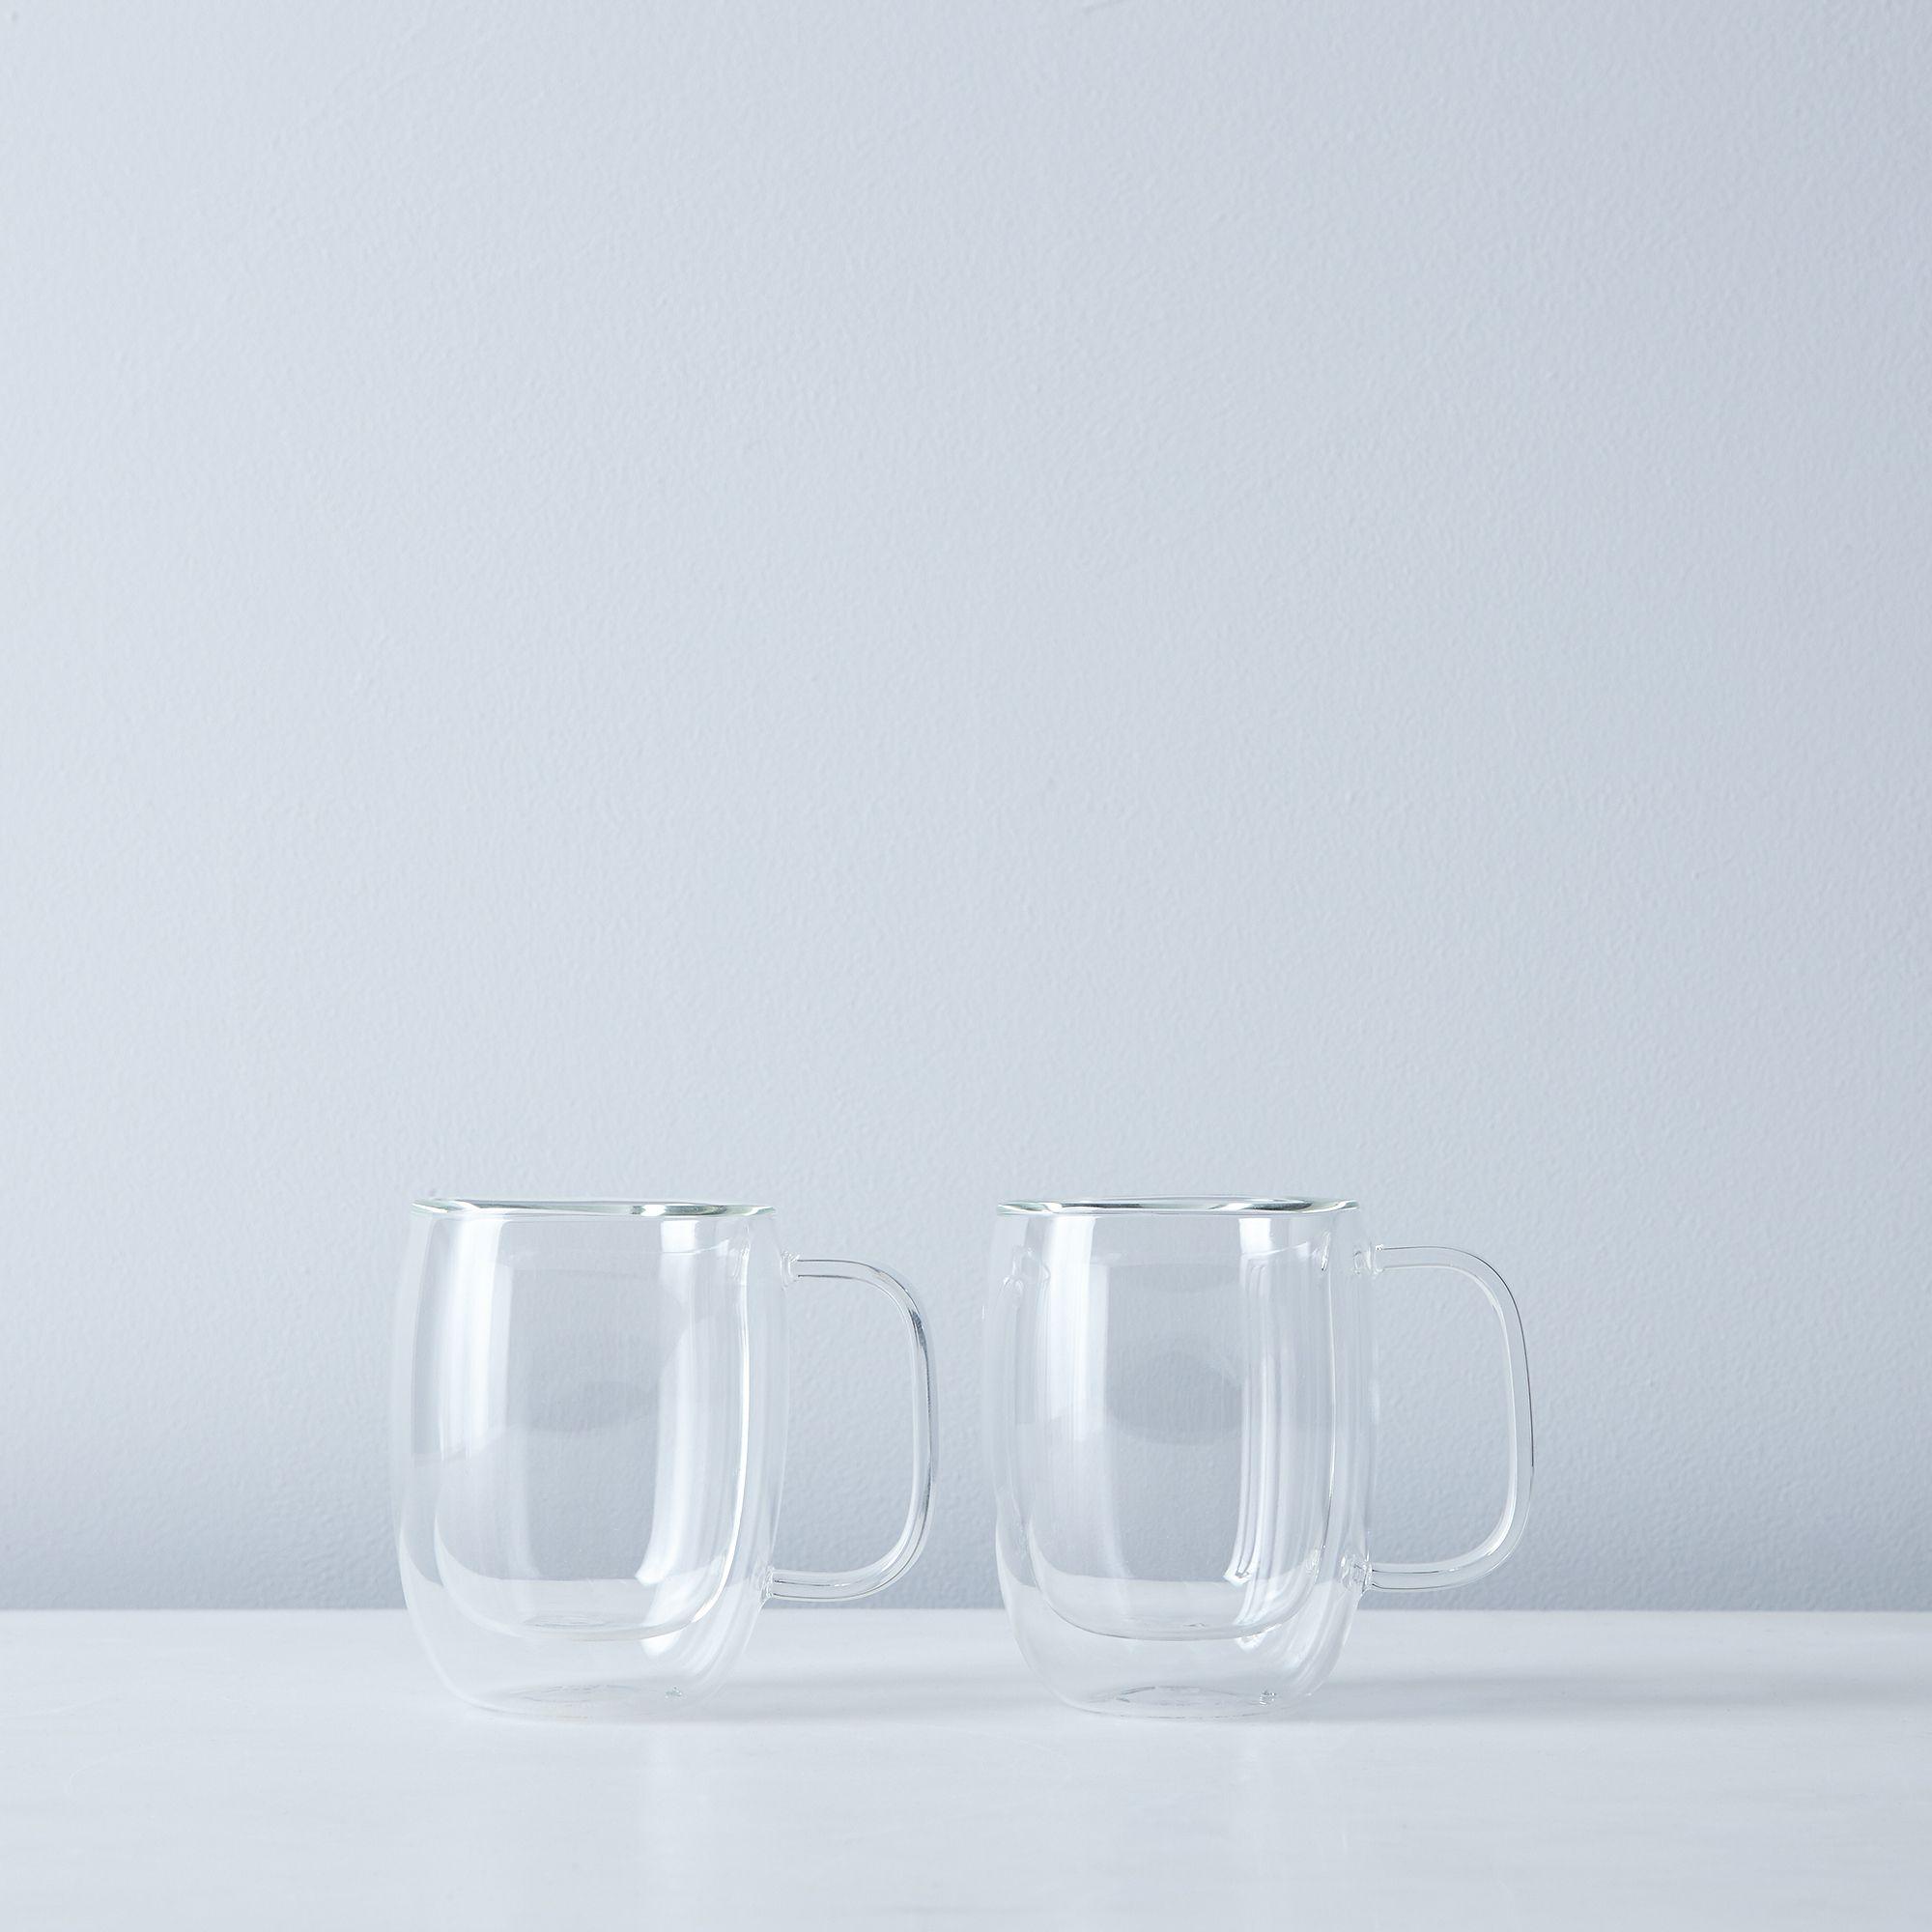 fdffbc36-9ae9-47b7-86d0-dec44e63347f–2016-0711_zwilling_sorrento-double-walled-mugs-with-handles_double_espresso_silo_rocky-luten_053